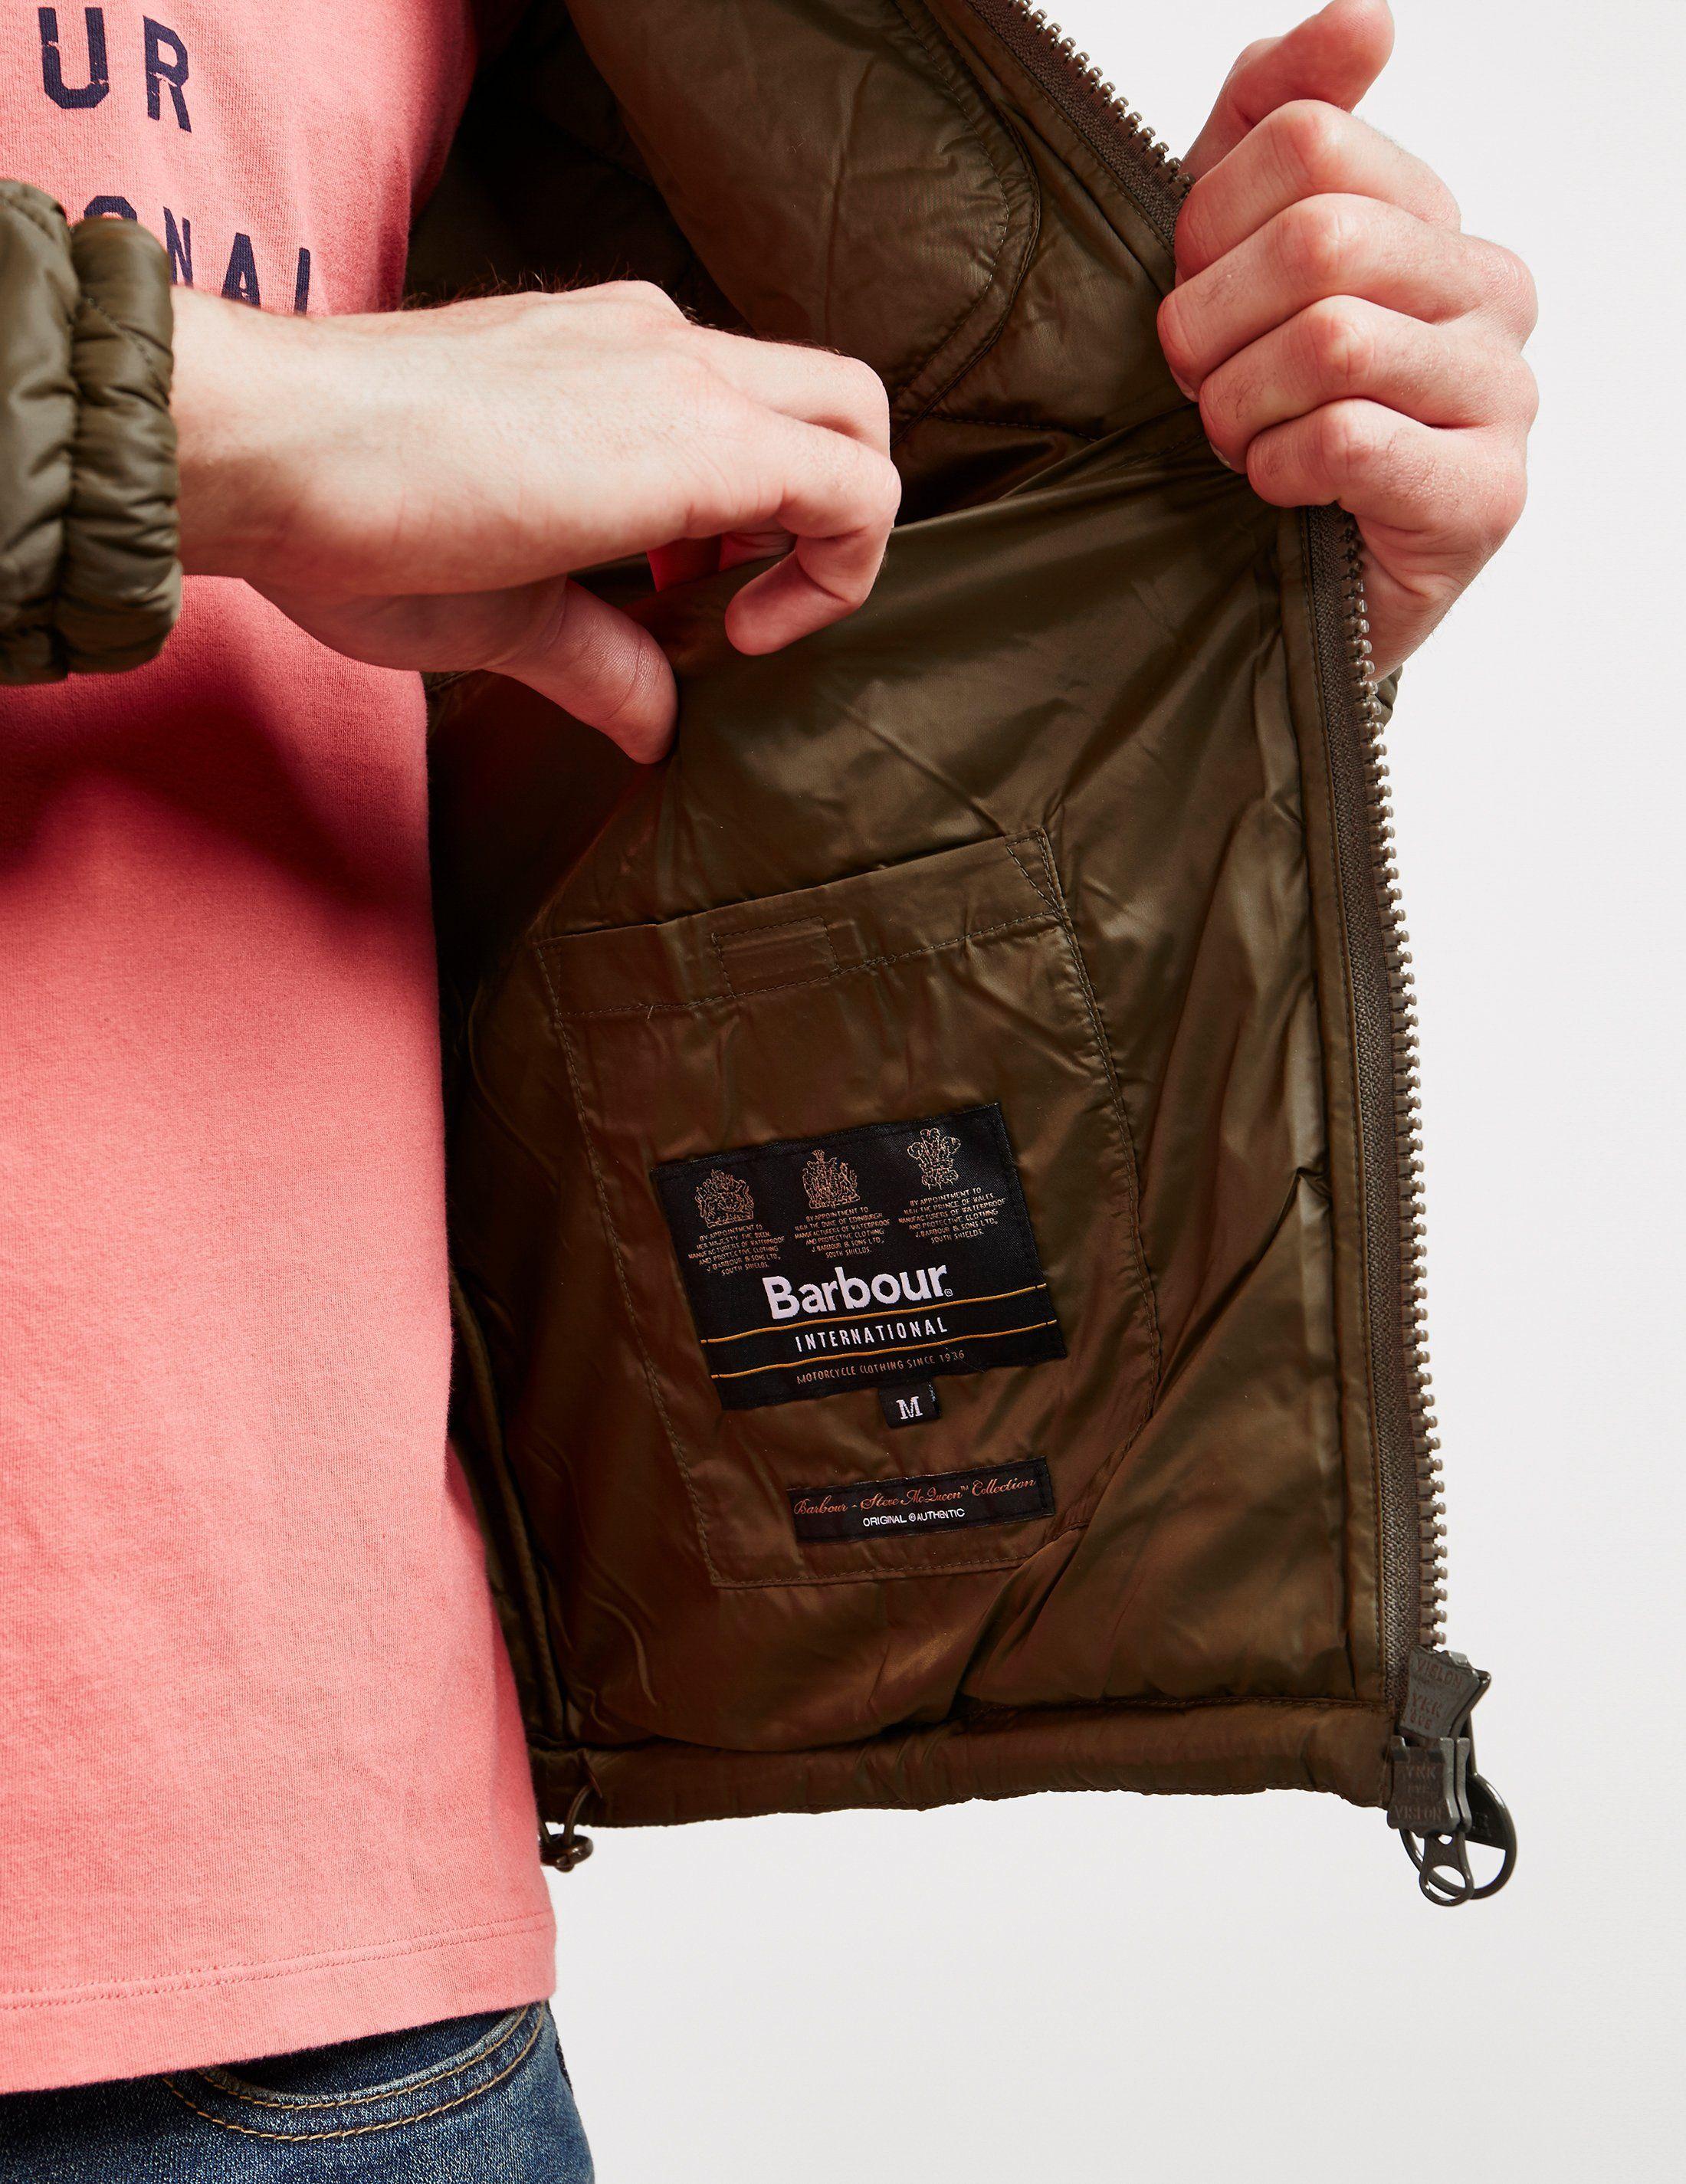 Barbour International Steve McQueen Acadia Padded Jacket